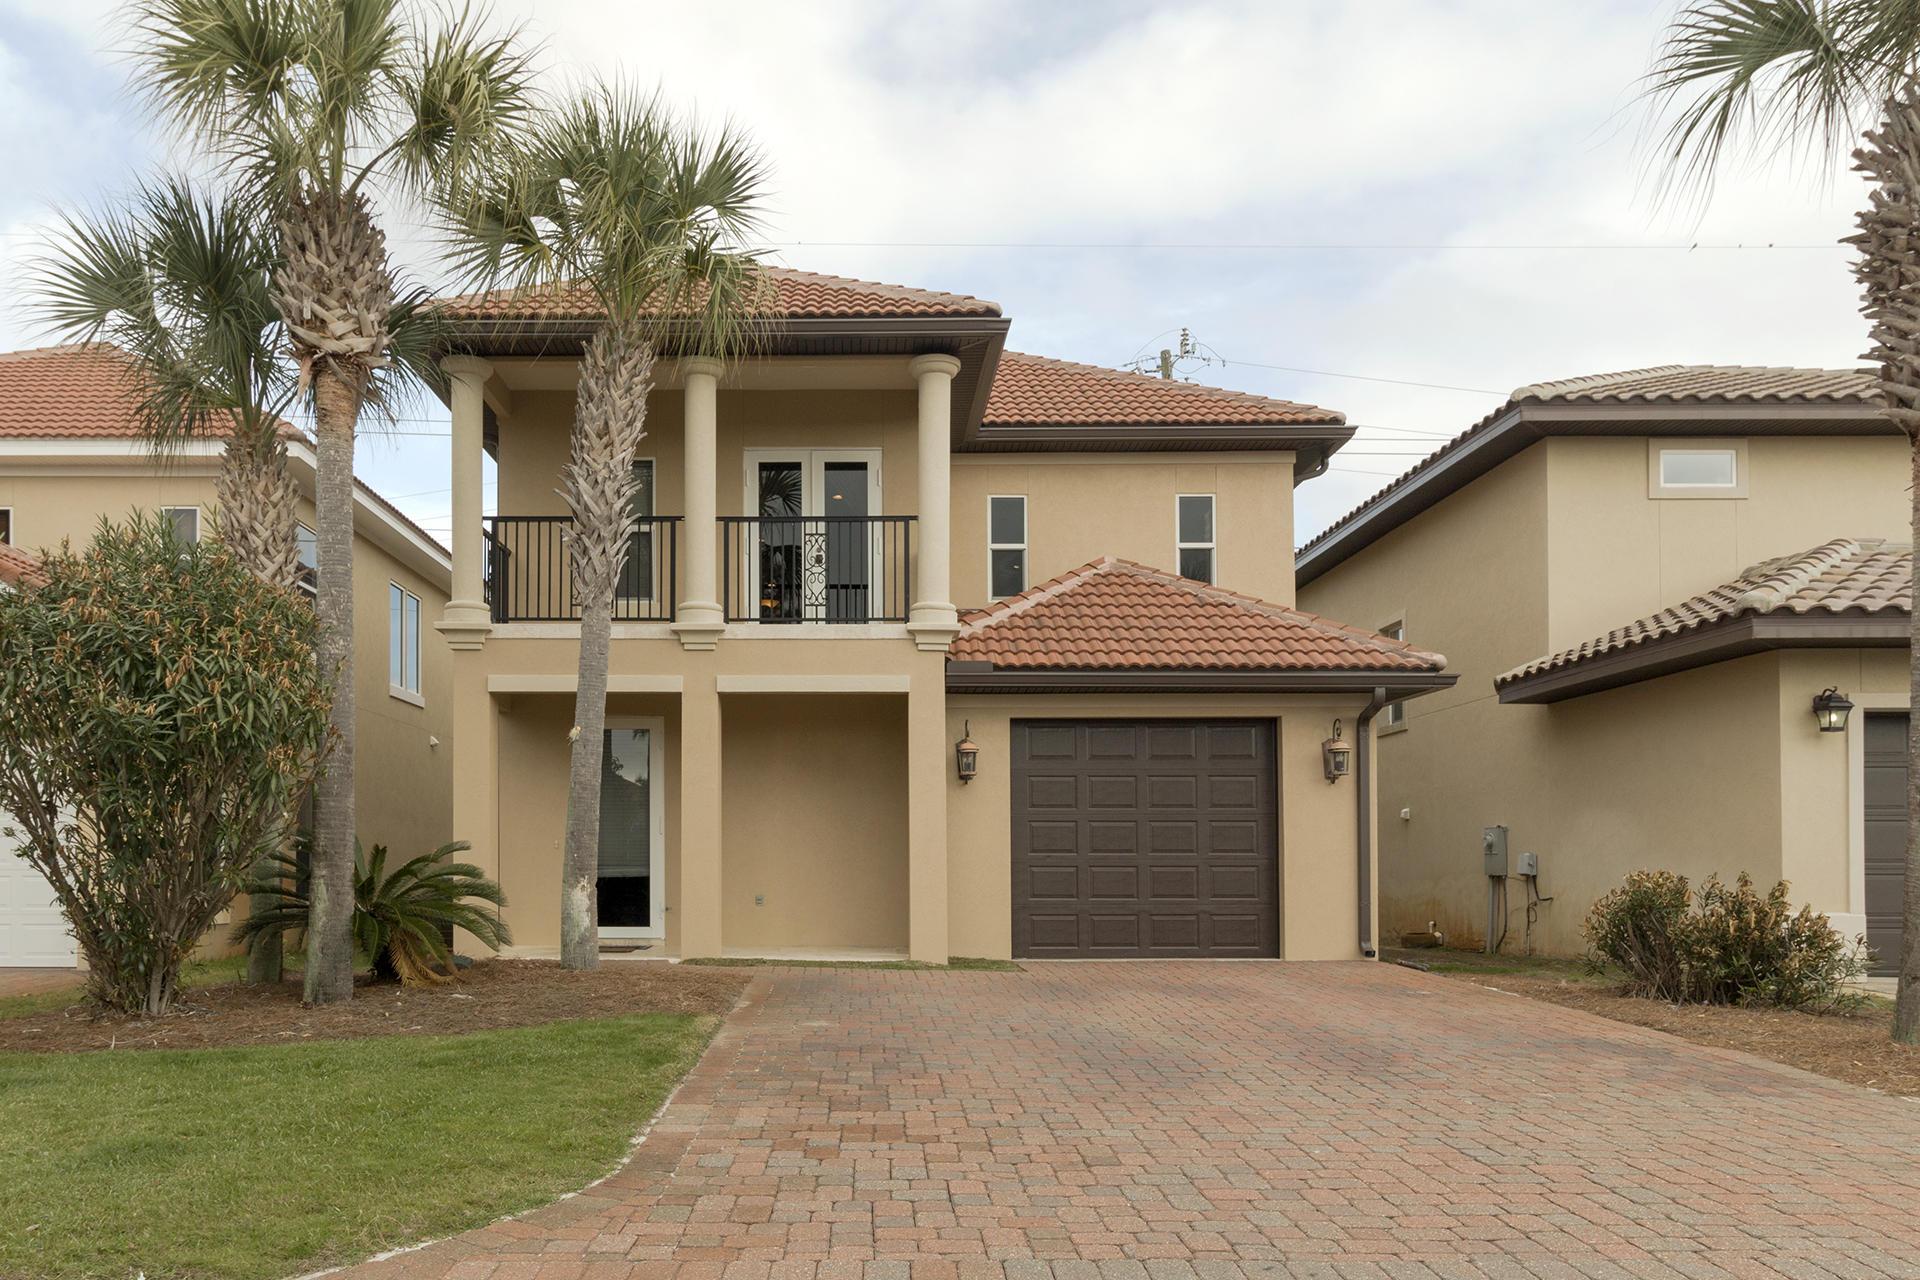 Destin Real Estate Listing, featured MLS property E767132